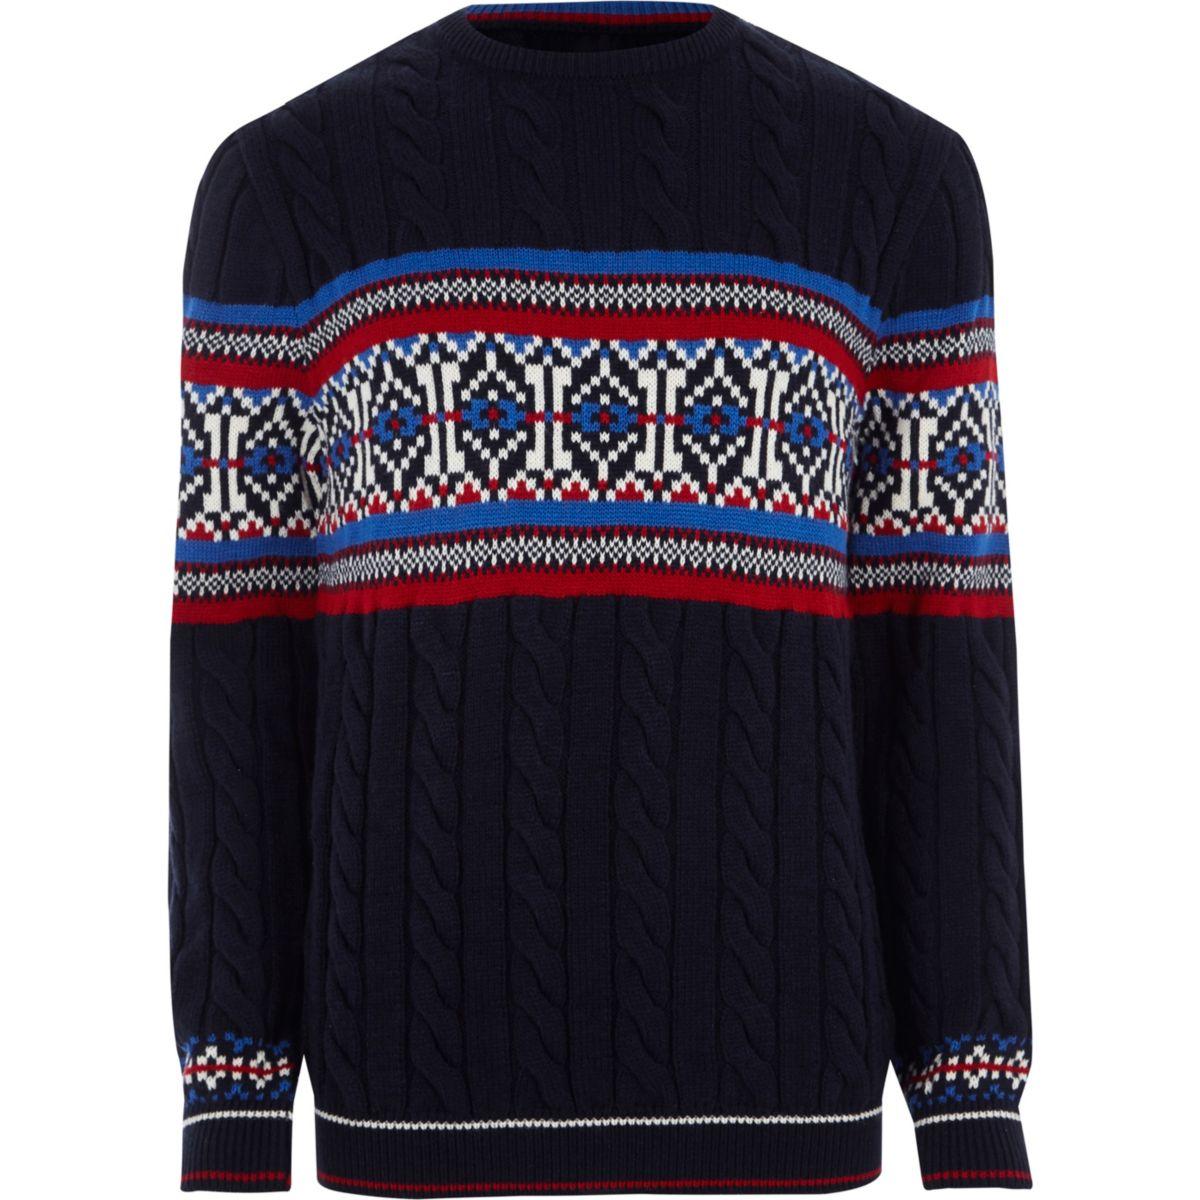 Navy Fairisle cable knit Christmas jumper